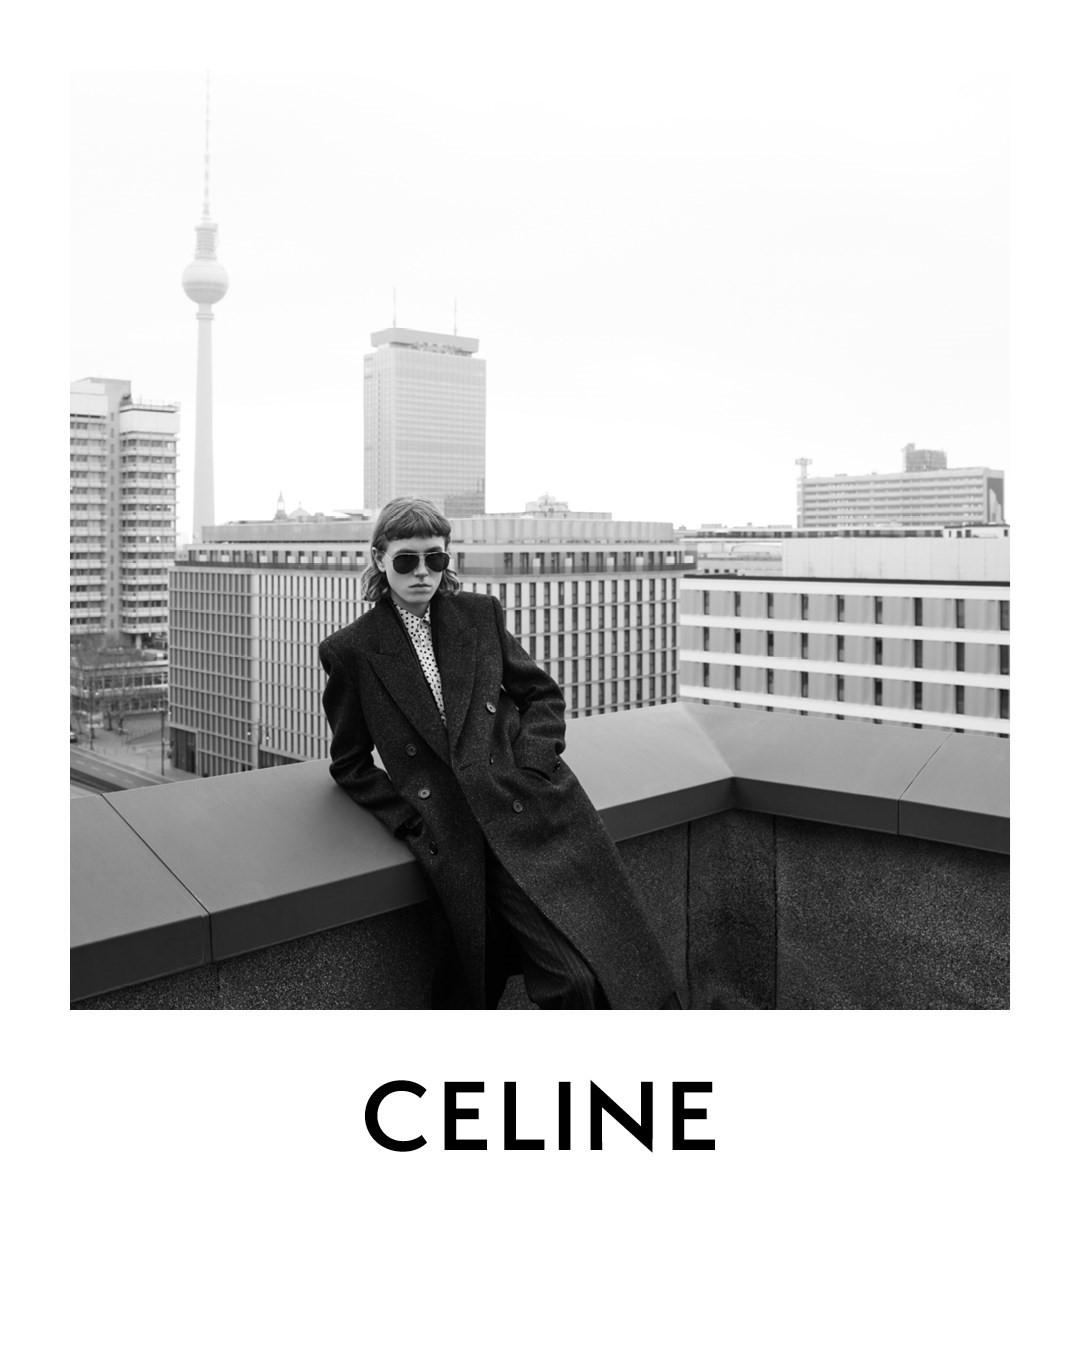 celine_mens_fall_2019_campaign2.jpg